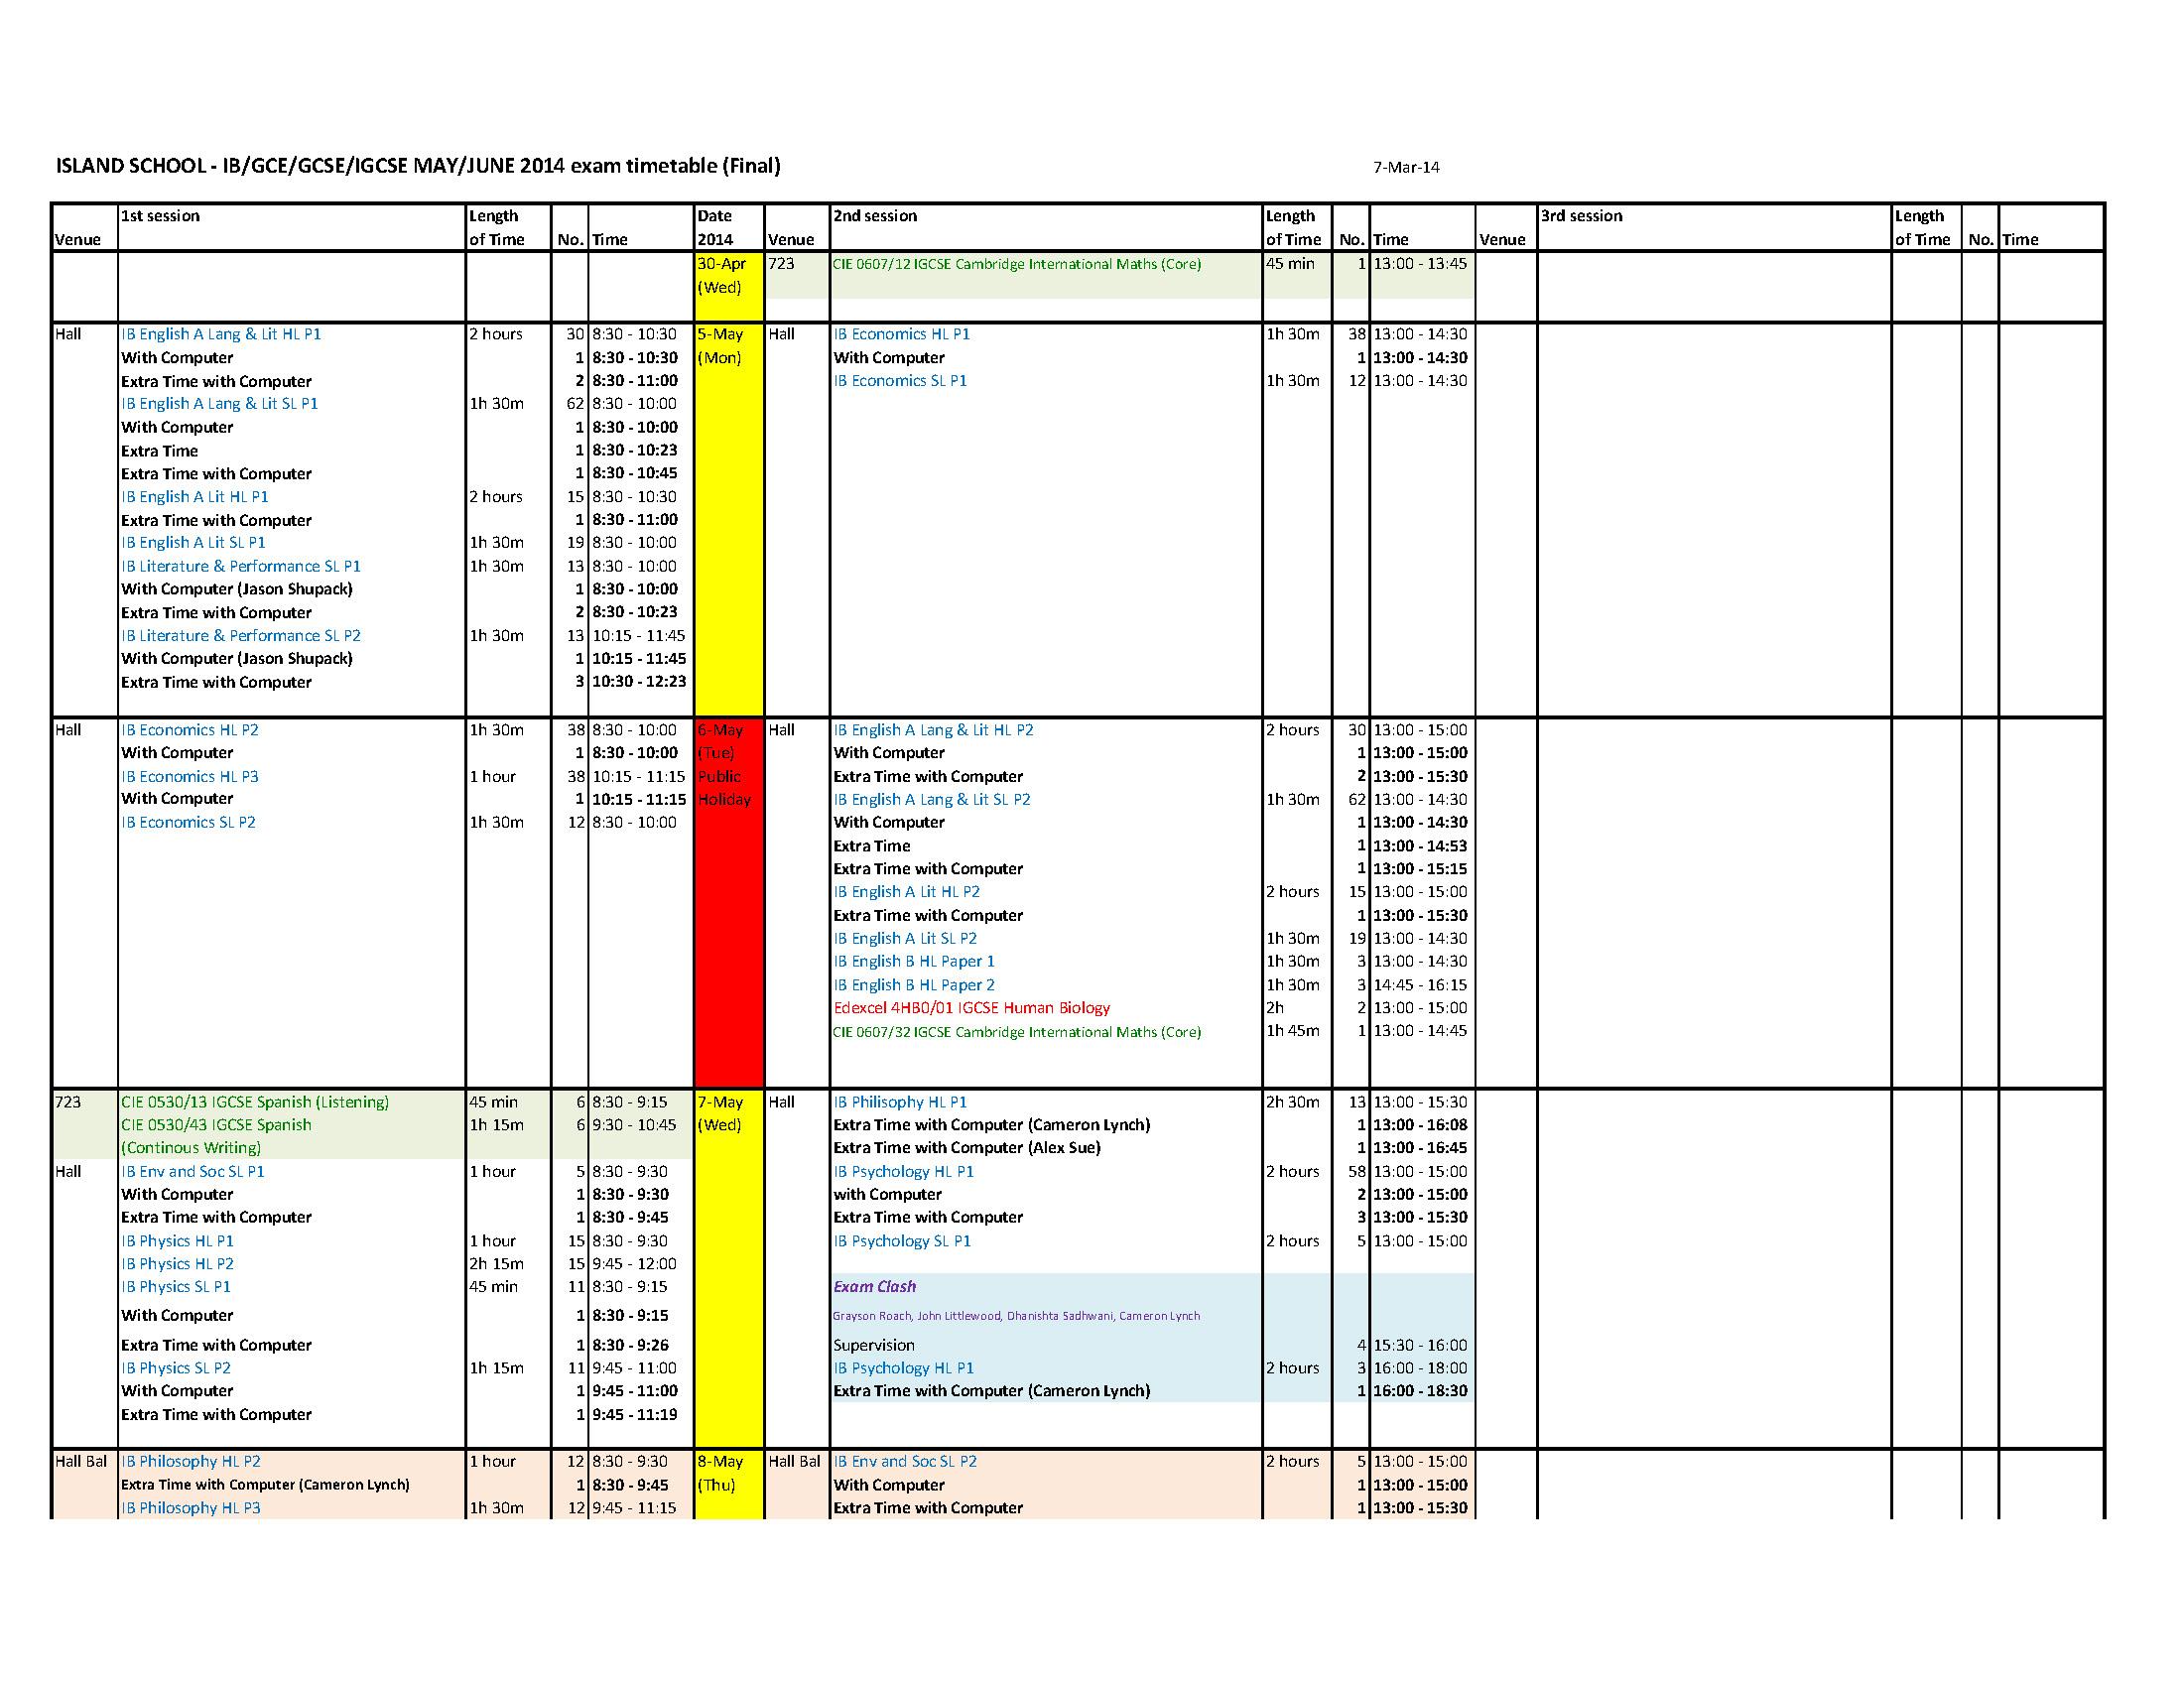 Ib Gce Gcse Igcse Exam Timetable May June 2014 Final Page 1 Jpg